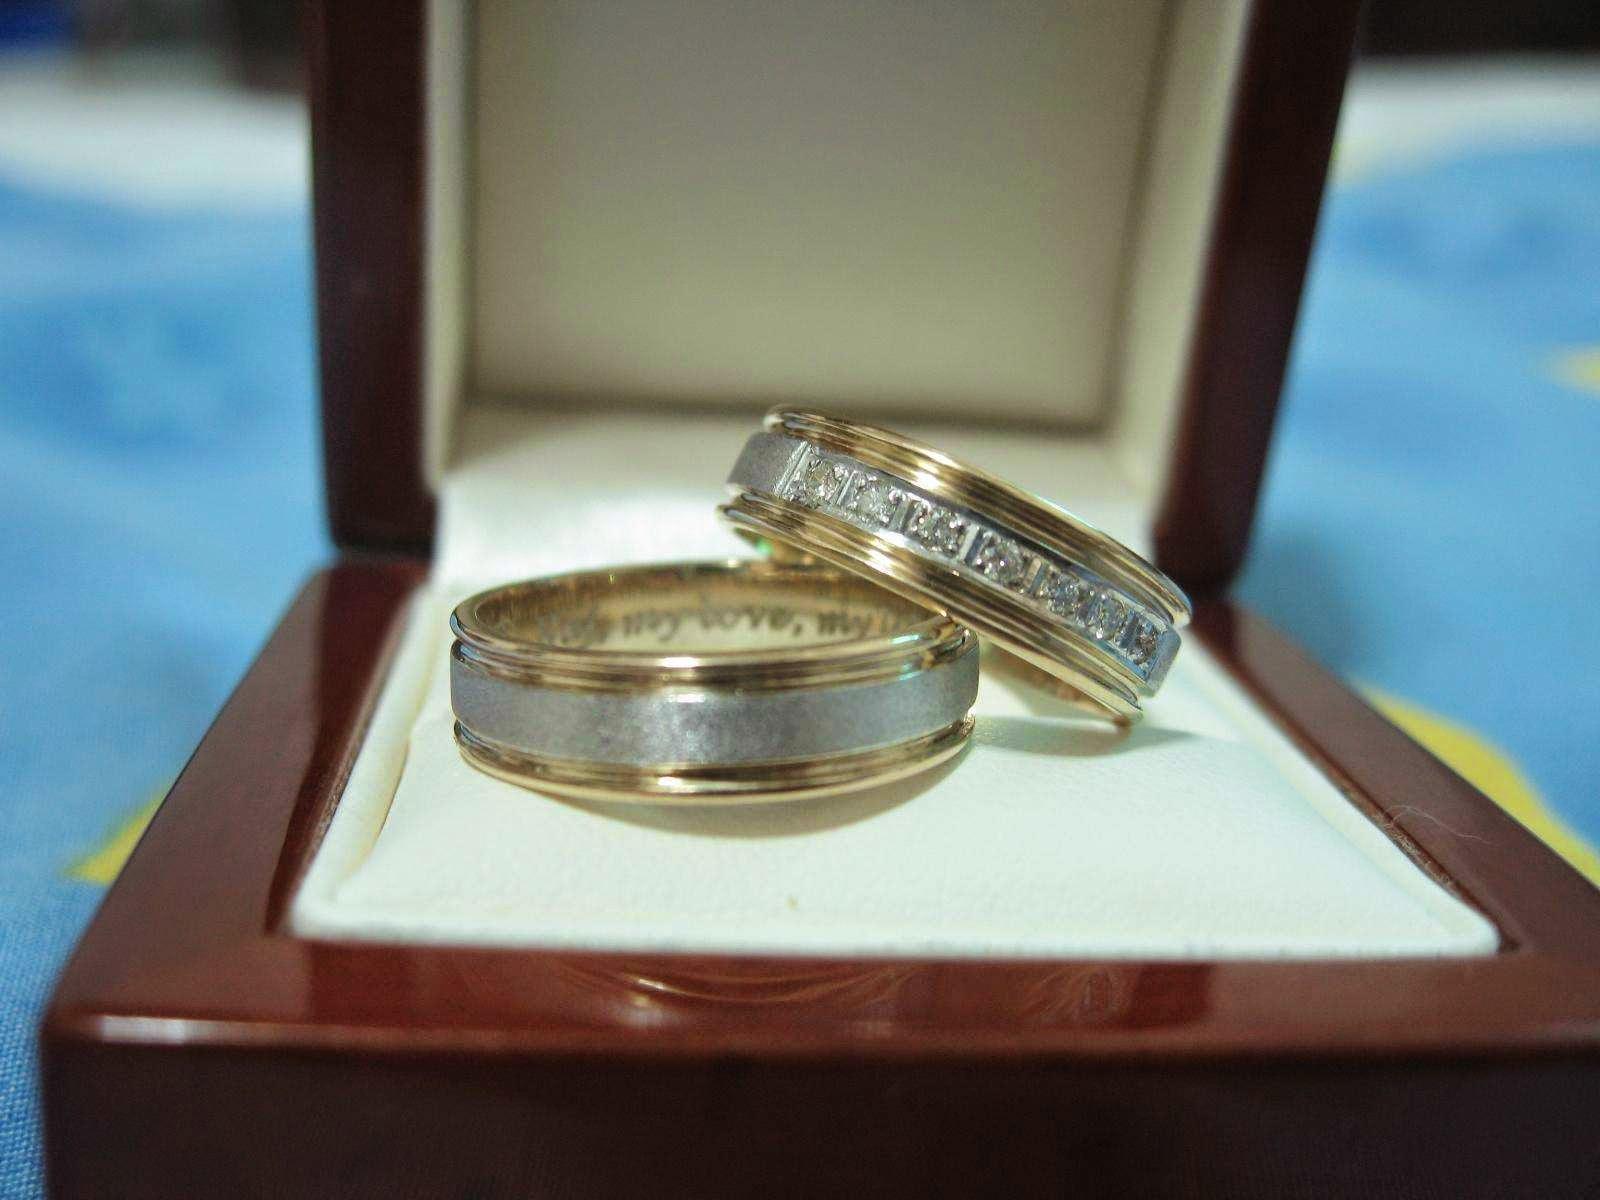 Gambar Cincin Pernikahan Kartun Gokil Abis